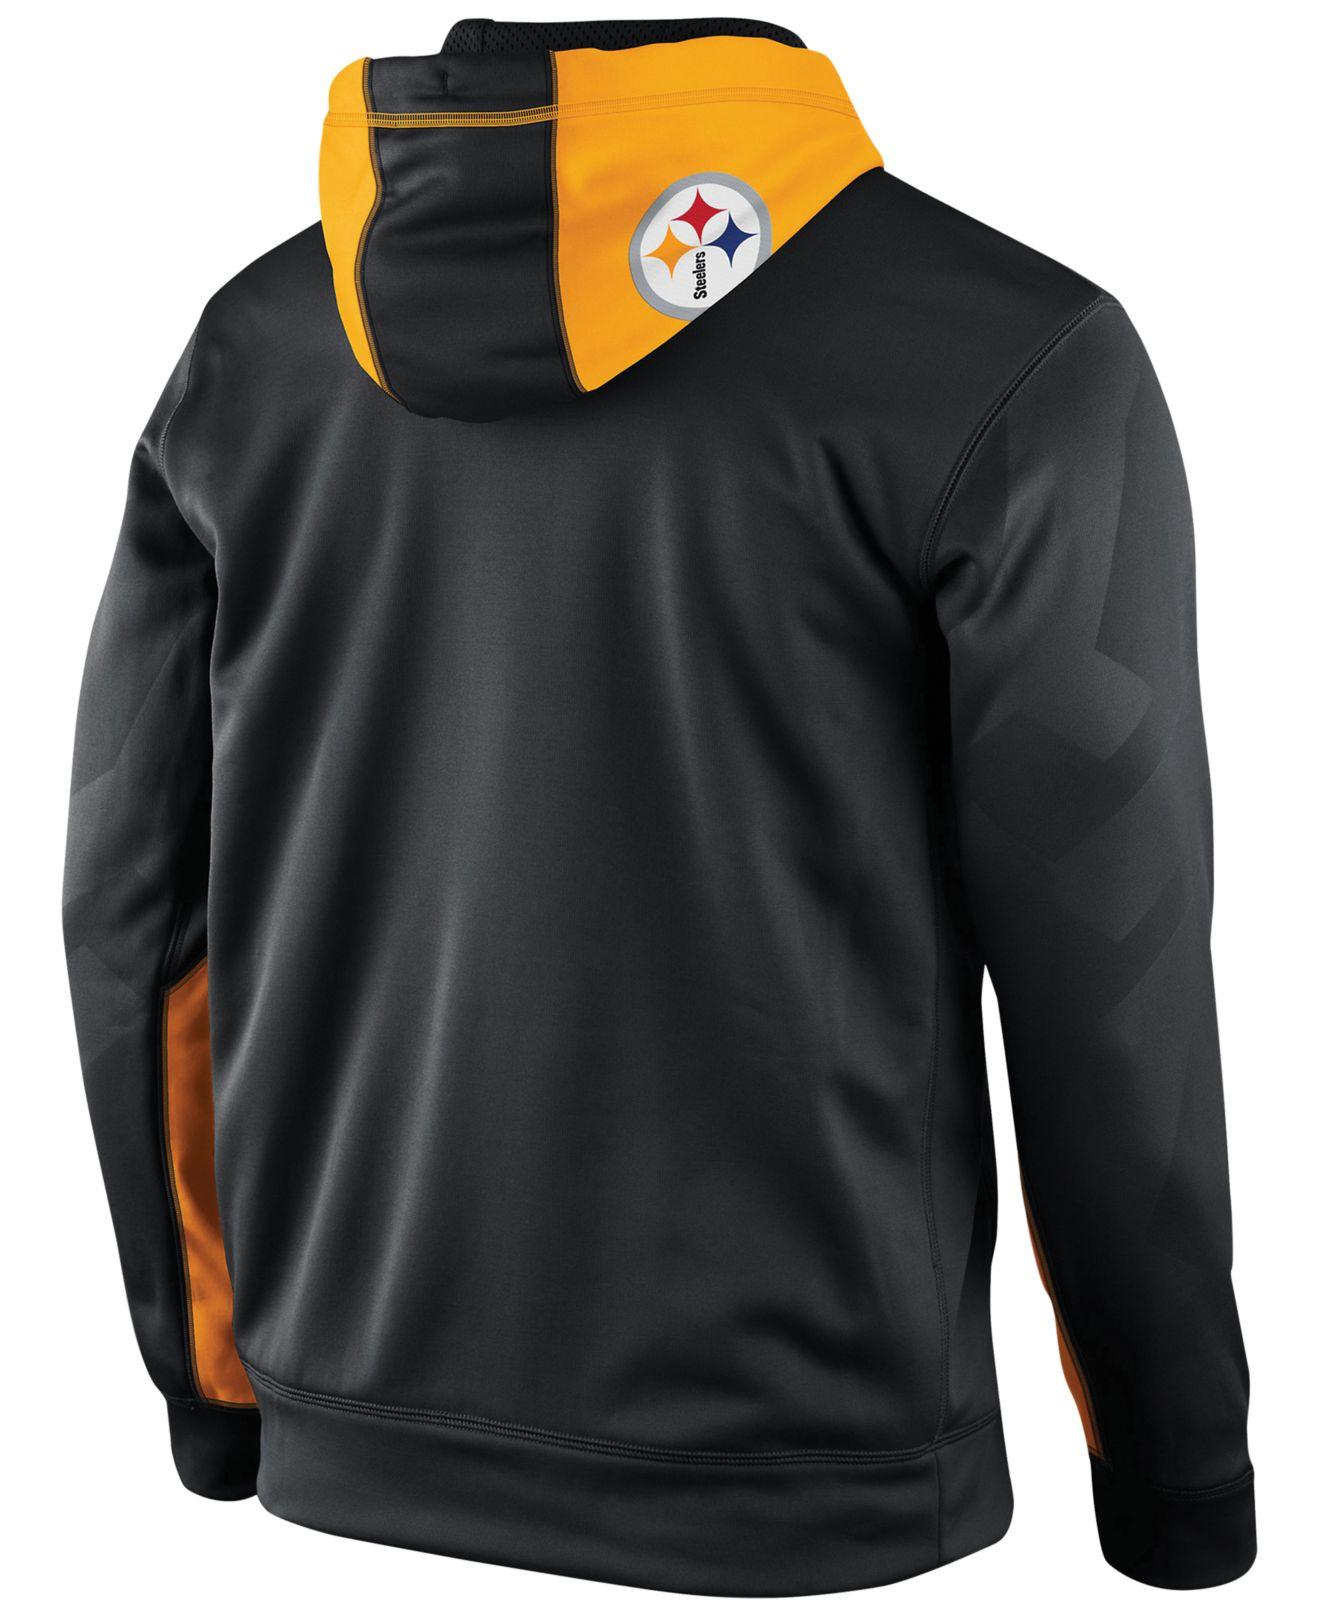 69e120168 Lyst - Nike Men S Pittsburgh Steelers Football Ko Full-Zip Therma ...